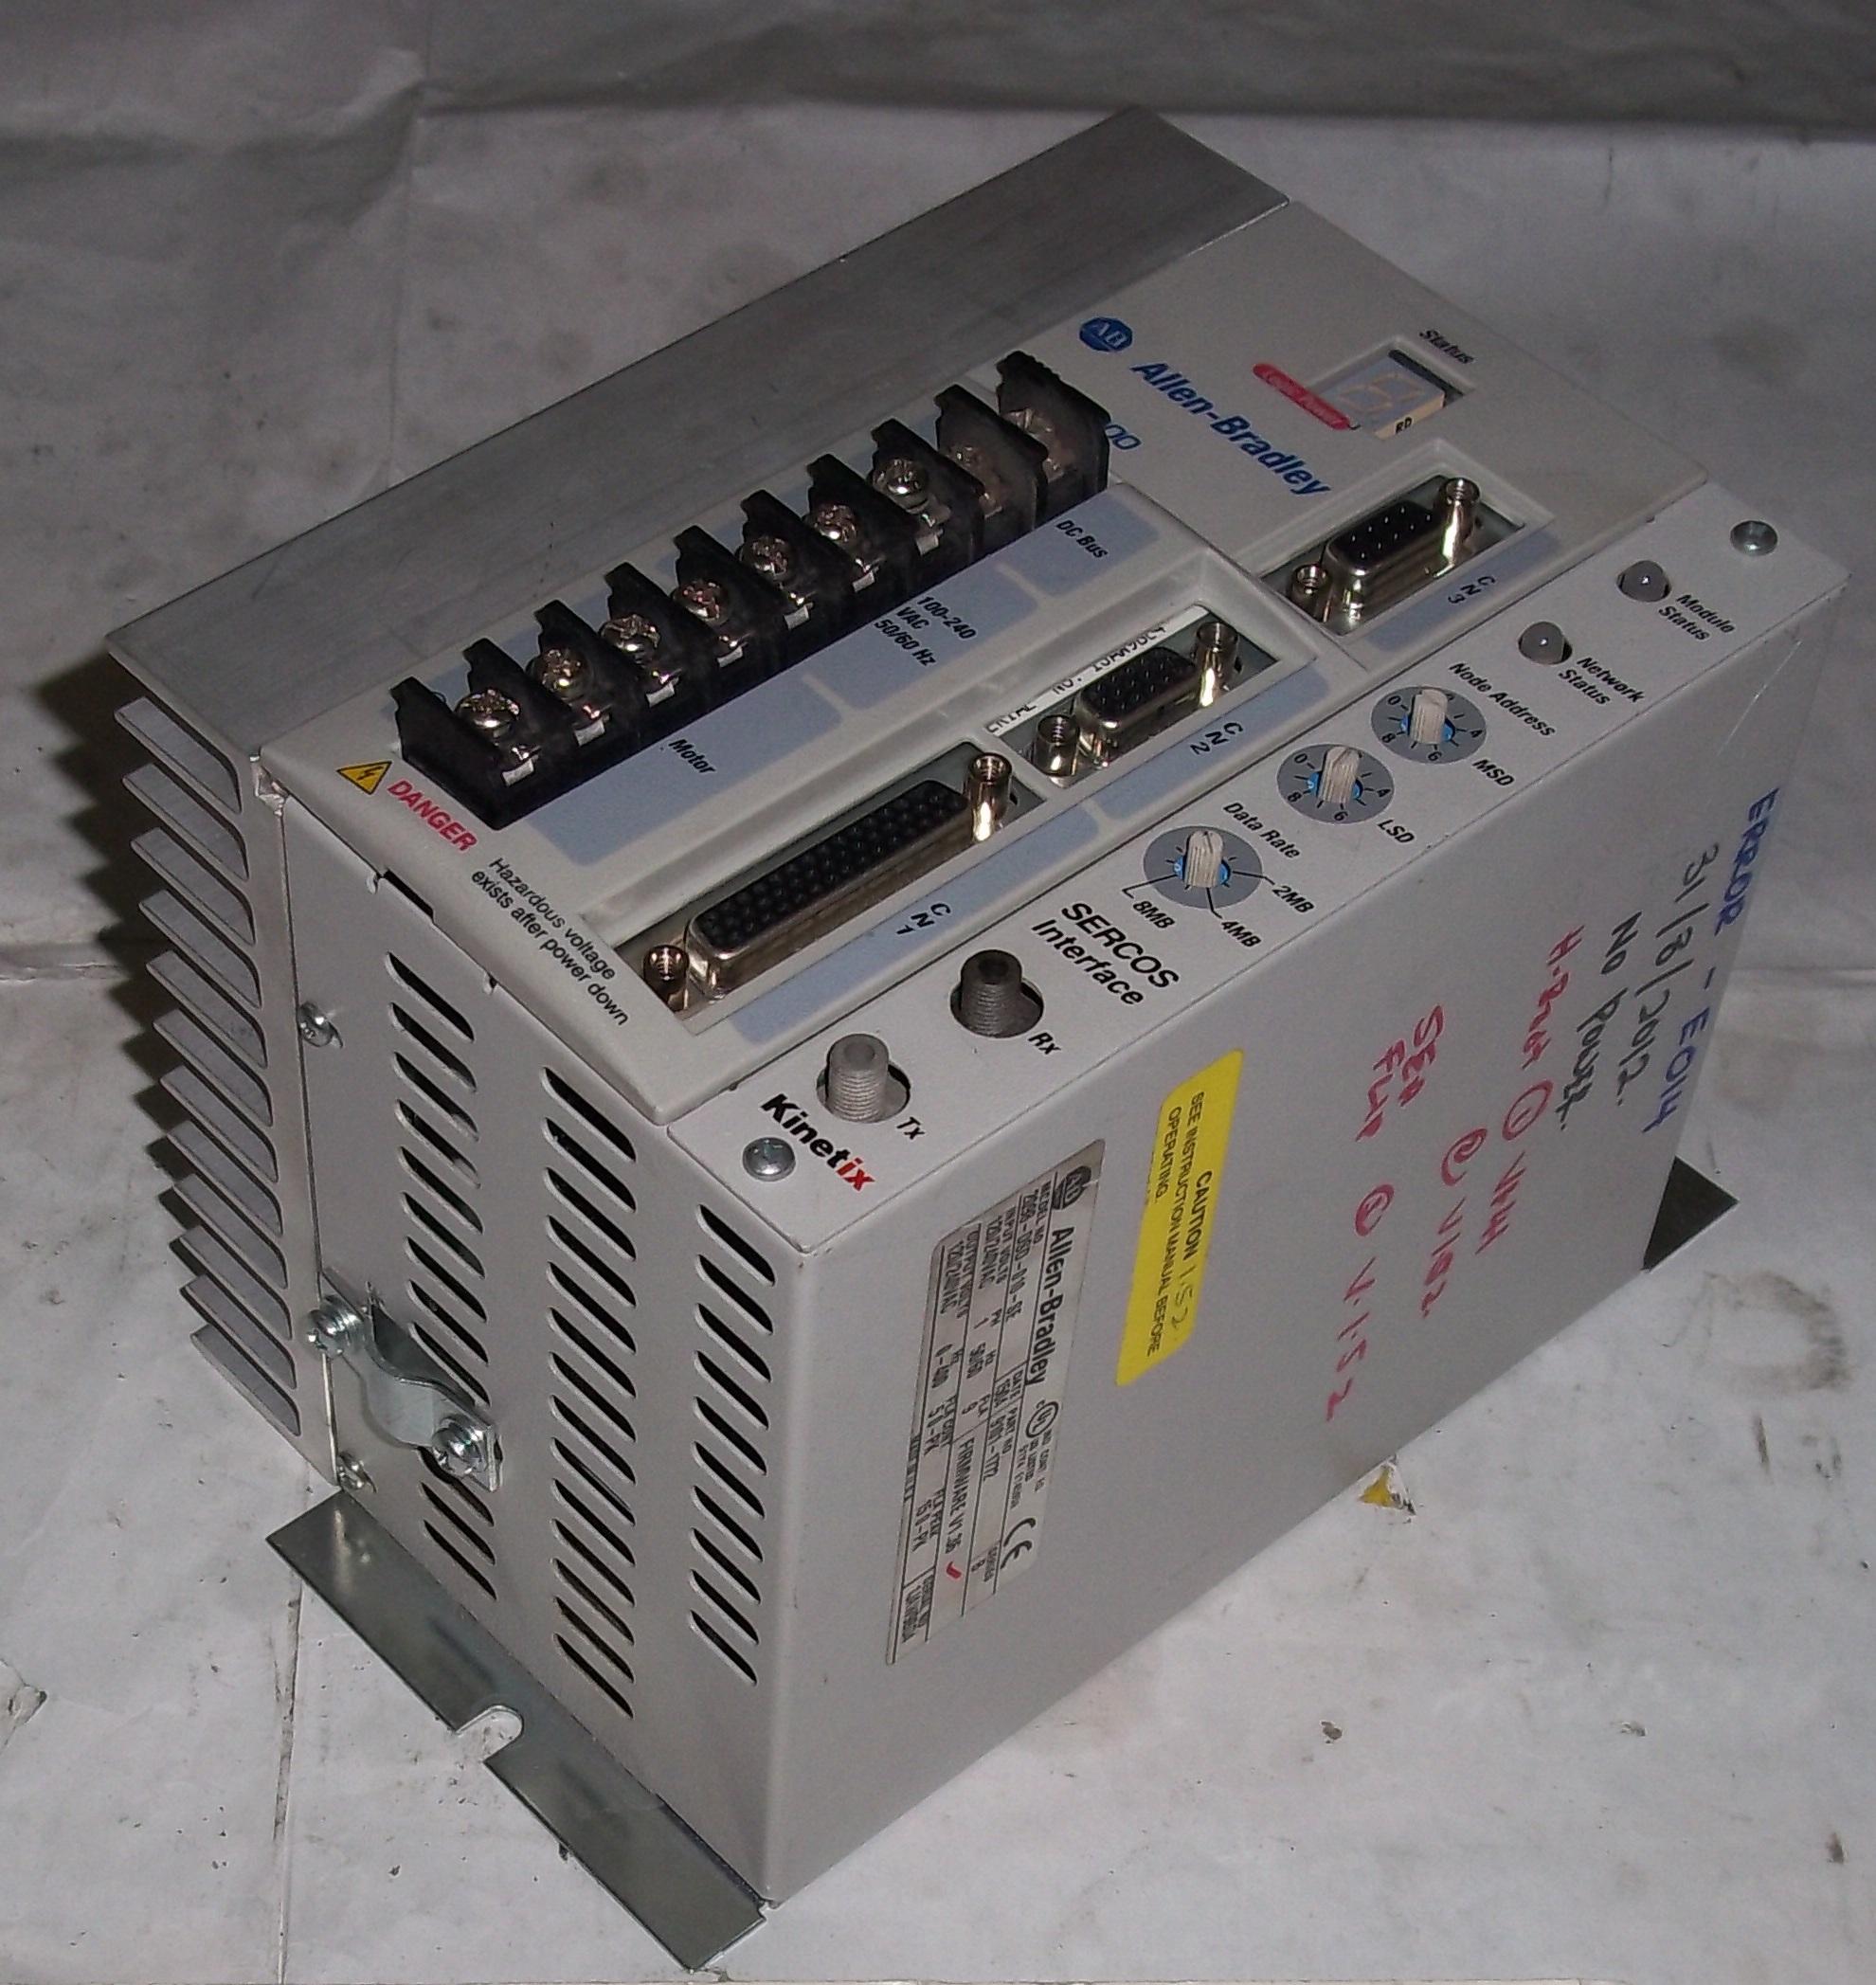 Repair 2098-DSD-010-SE ALLEN-BRADLEY  ALLEN-BRADLEY ULTRA 3000 (2098-DSD-010-SE) in Malaysia, Singapore, Thailand, Indonesia